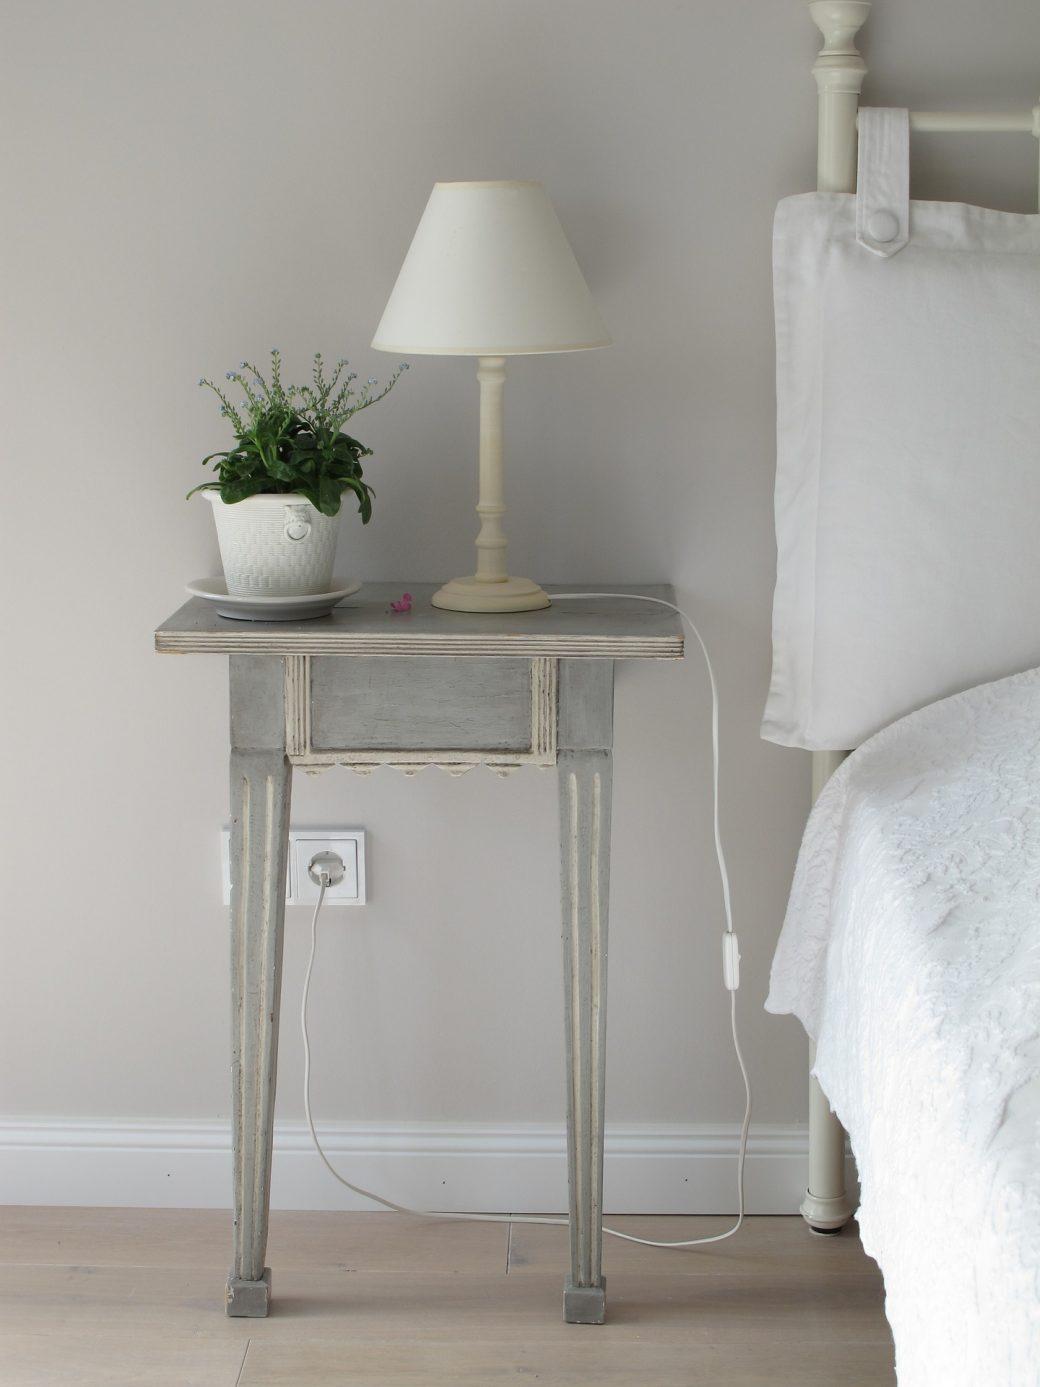 Nachtkastjes en commodes voor iedere slaapkamer | Designlife